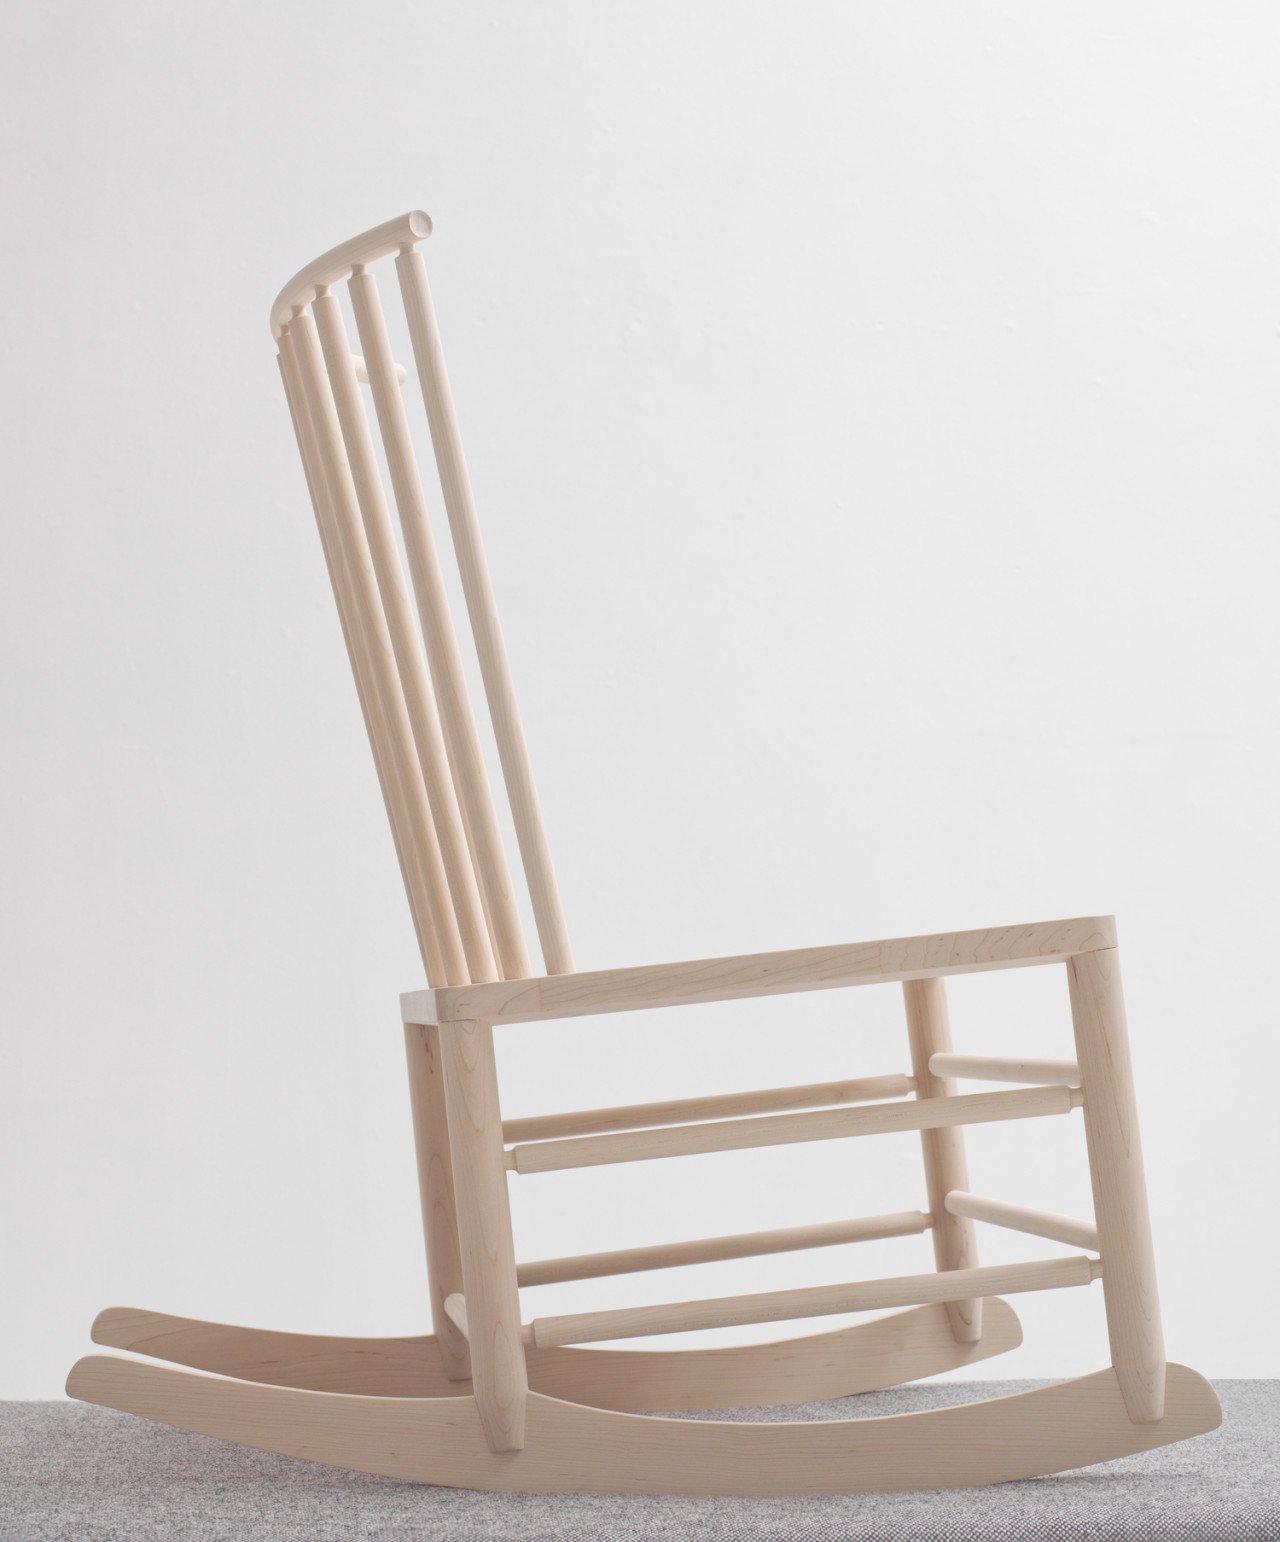 Rocking chair by Studio Gorm  Photo 9 of 26 in Furnishing Utopia By Hancock Shaker Village